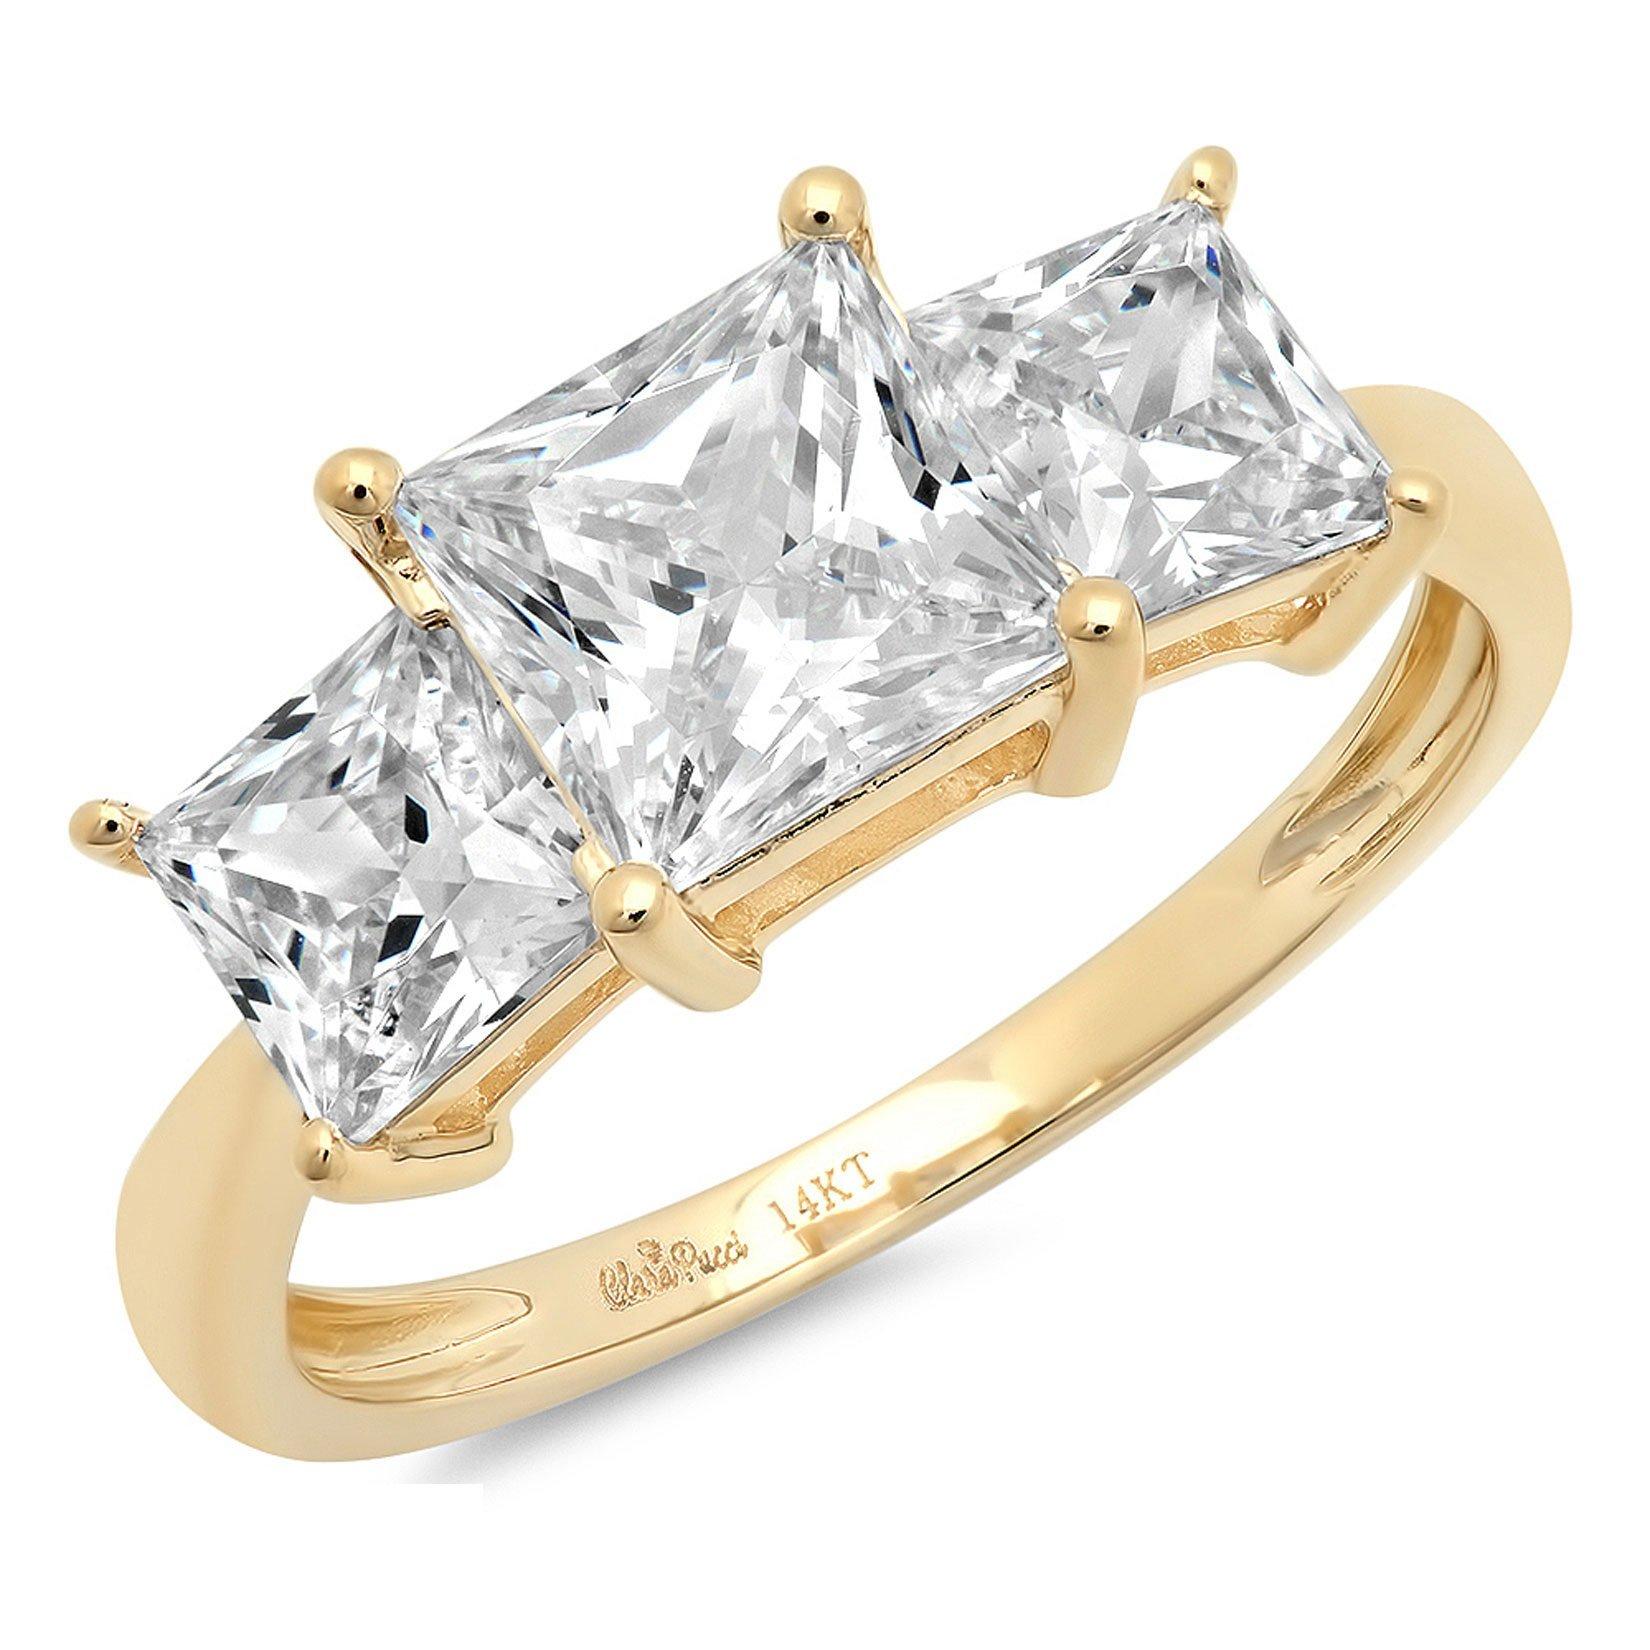 3.0ct Three Stone Princess Cut Simulated Diamond CZ Ring Engagement Wedding Band 14K Yellow Gold, 8.75 by Clara Pucci